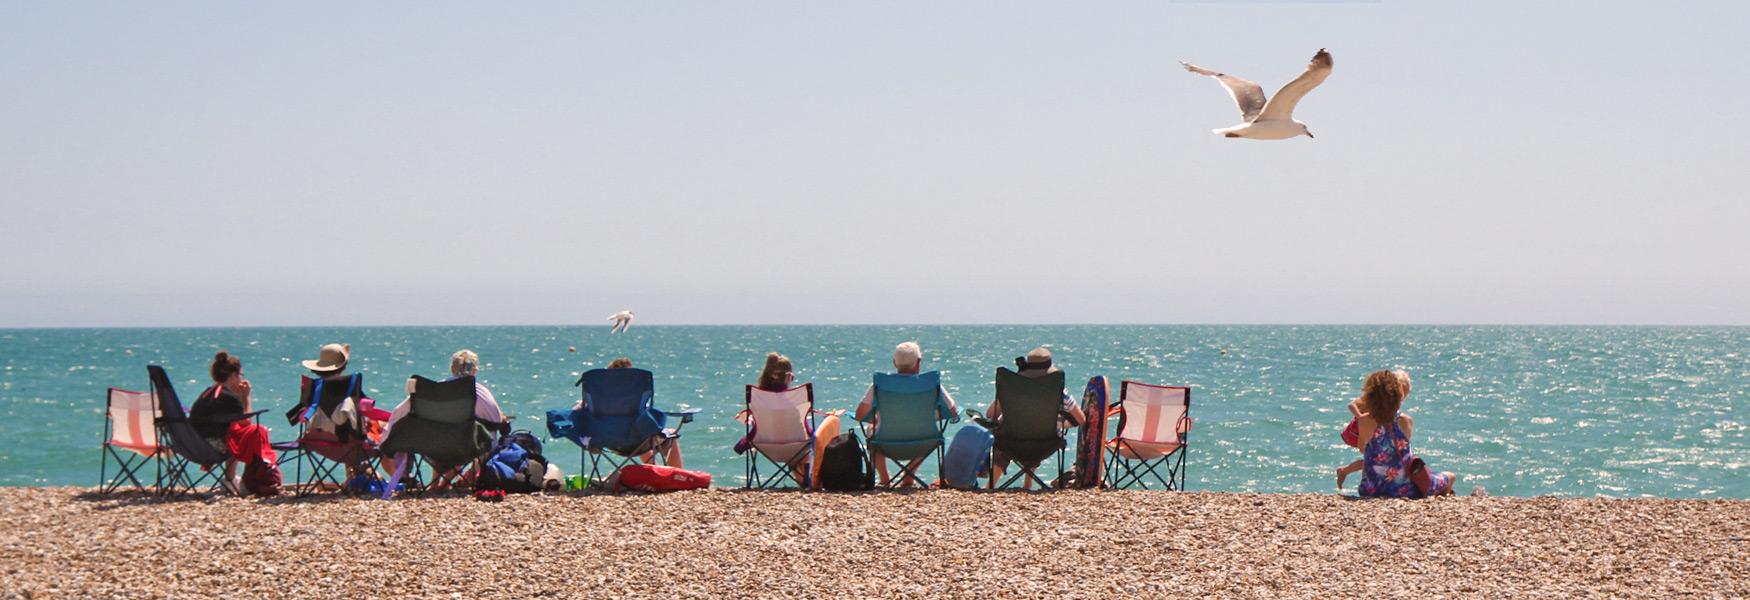 Sitting on Bognor Regis Beach